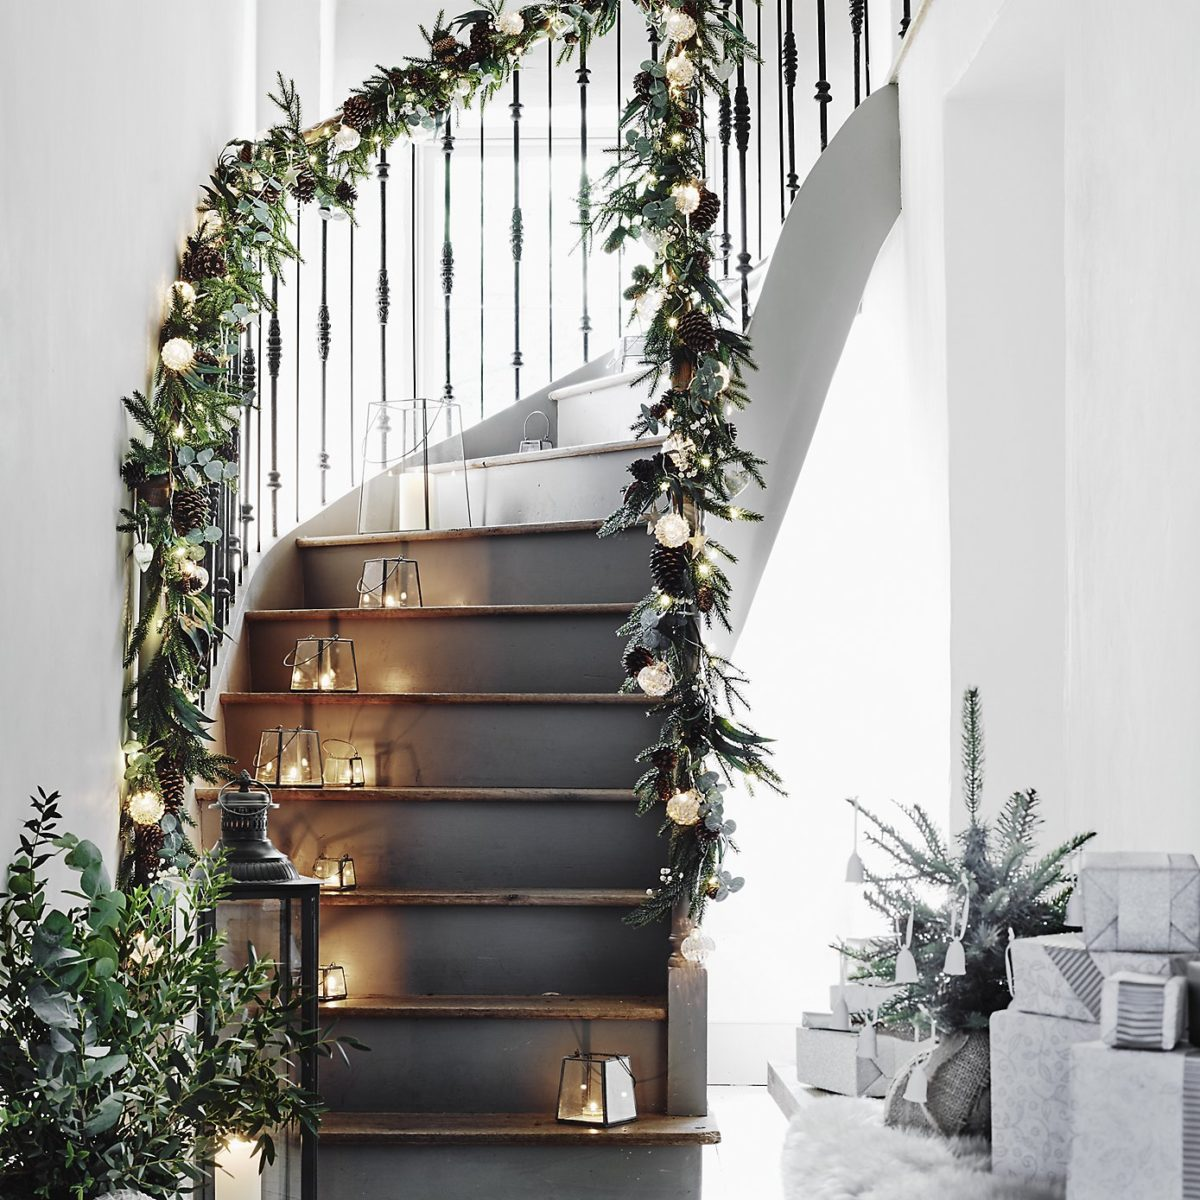 decorazioni-natalizie-scandinave-scala